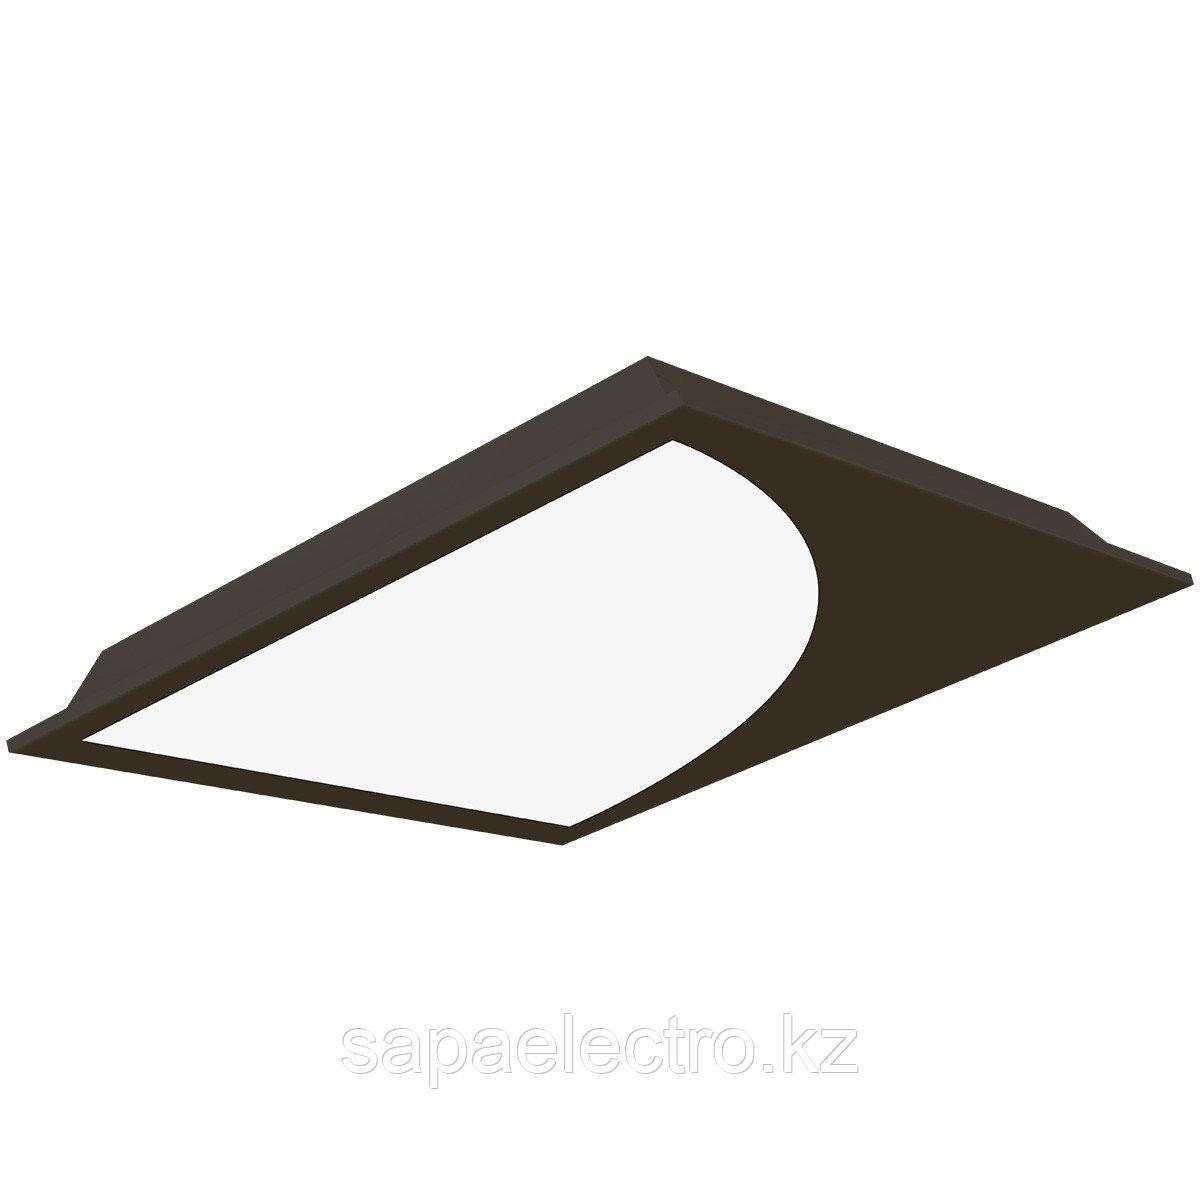 Св-к  OPALLED PLANET 48W BLACK S/A  600x600 5700K